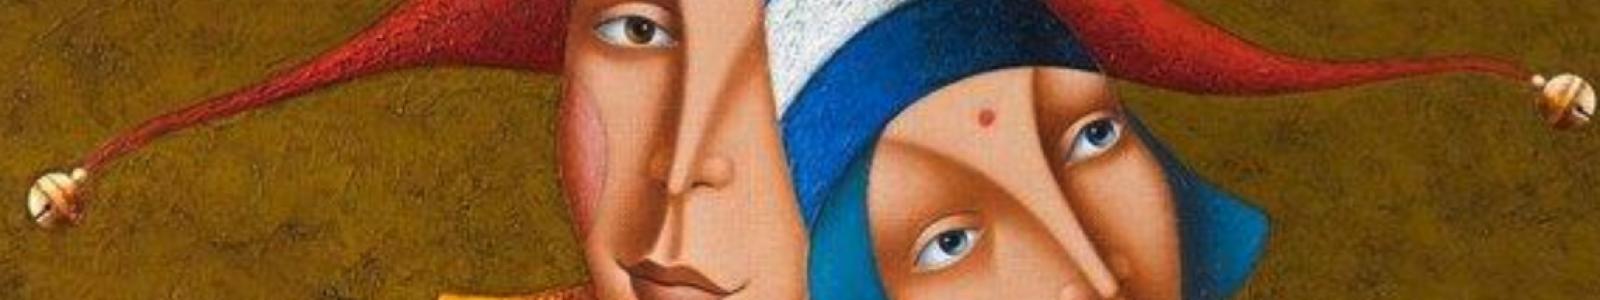 Gallery Painter ALEXEY KIRIANOV